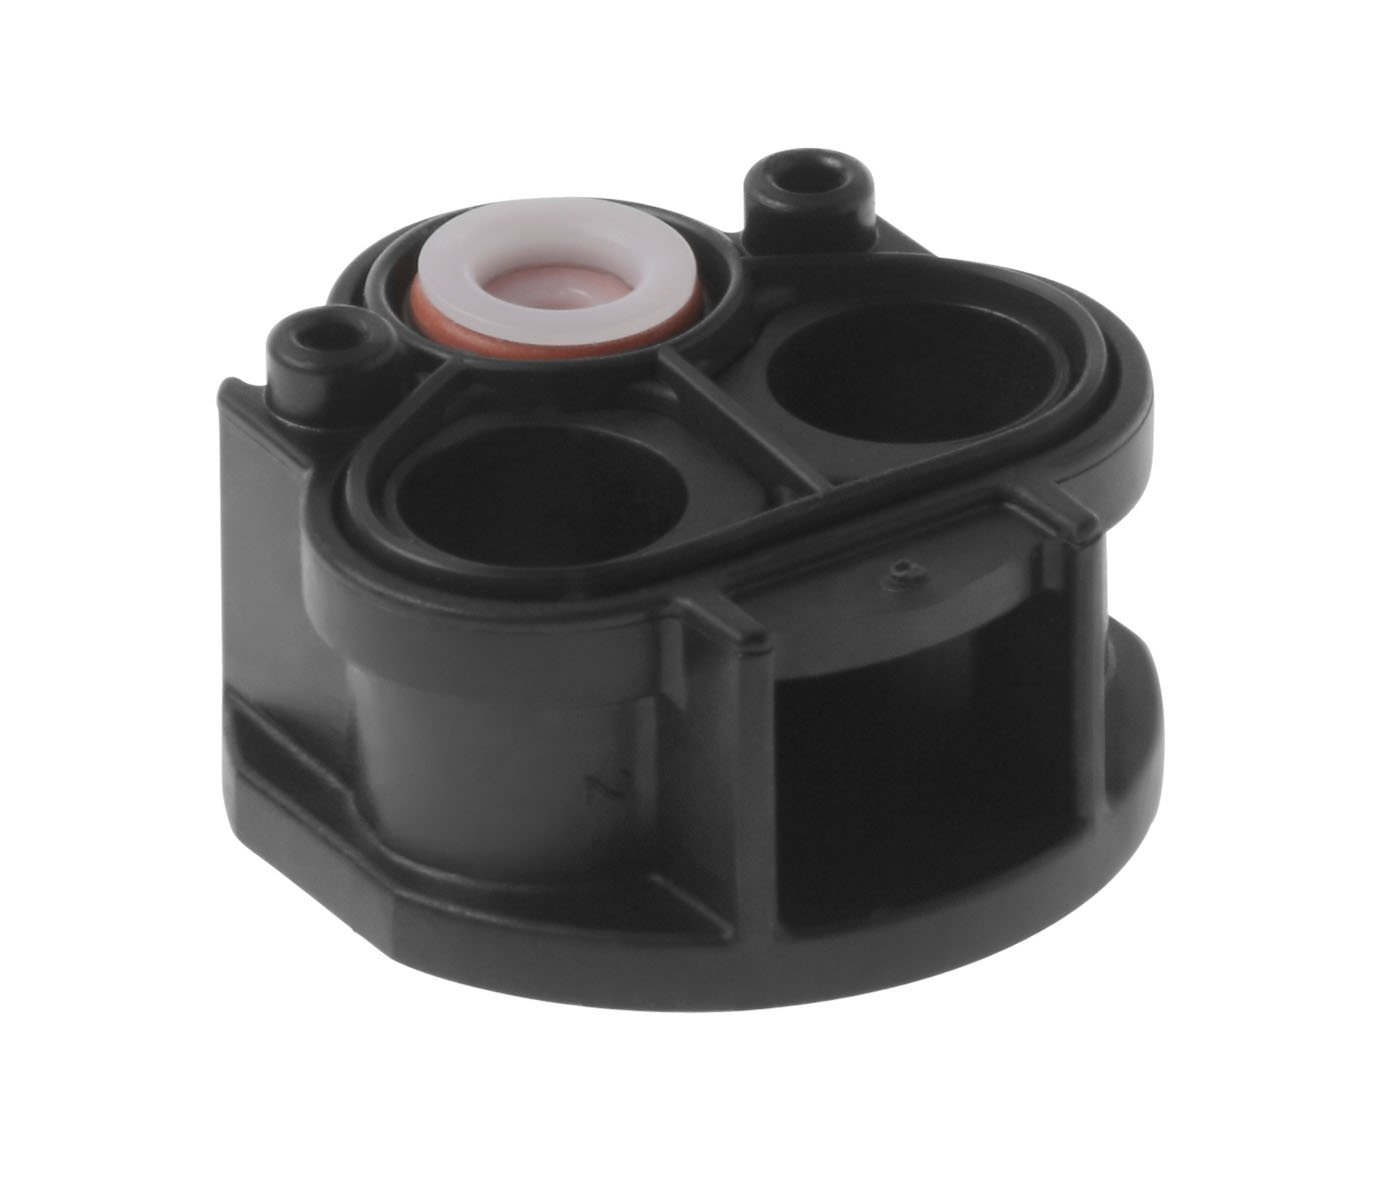 KOHLER K-1060800 Faucet Spacer